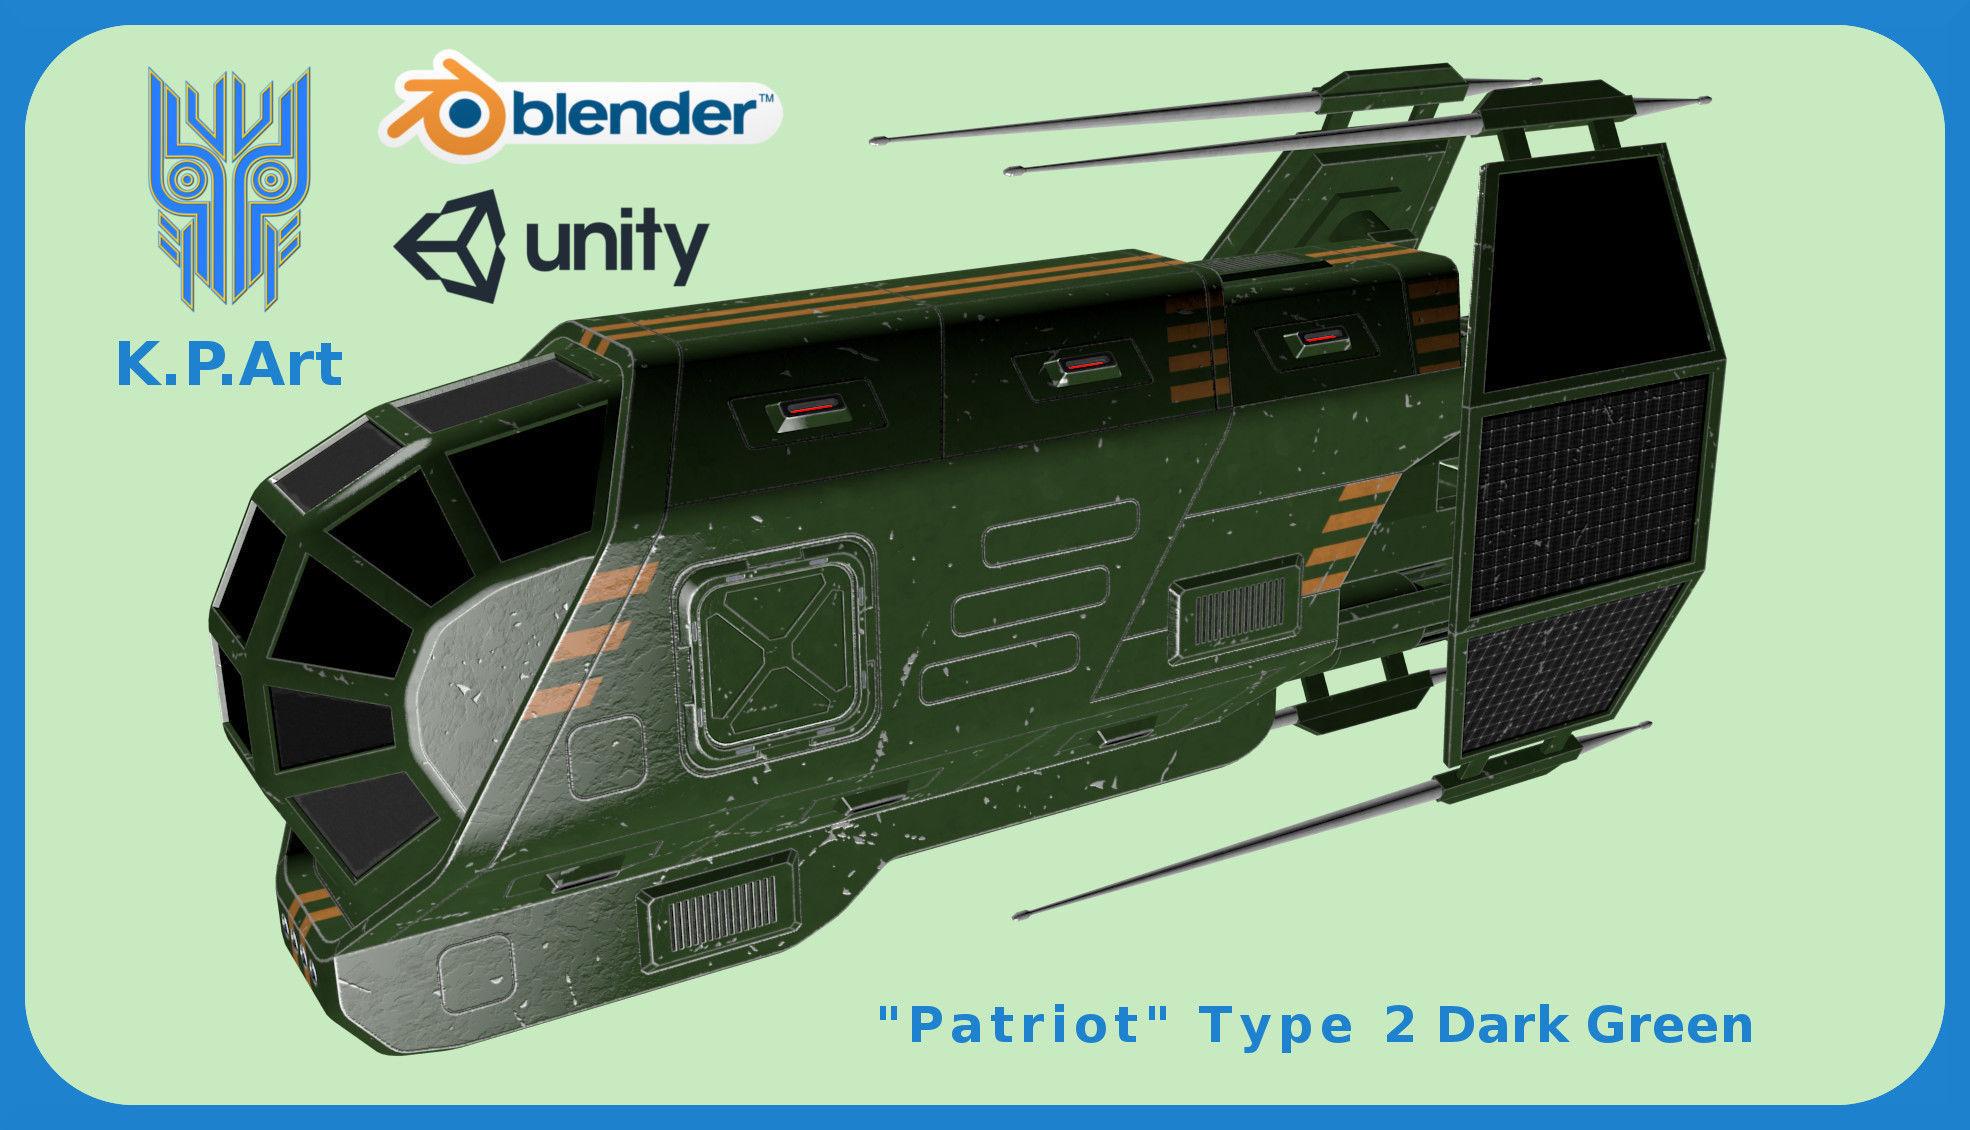 Spaceship Patriot Type 2 Dark Green | 3D model